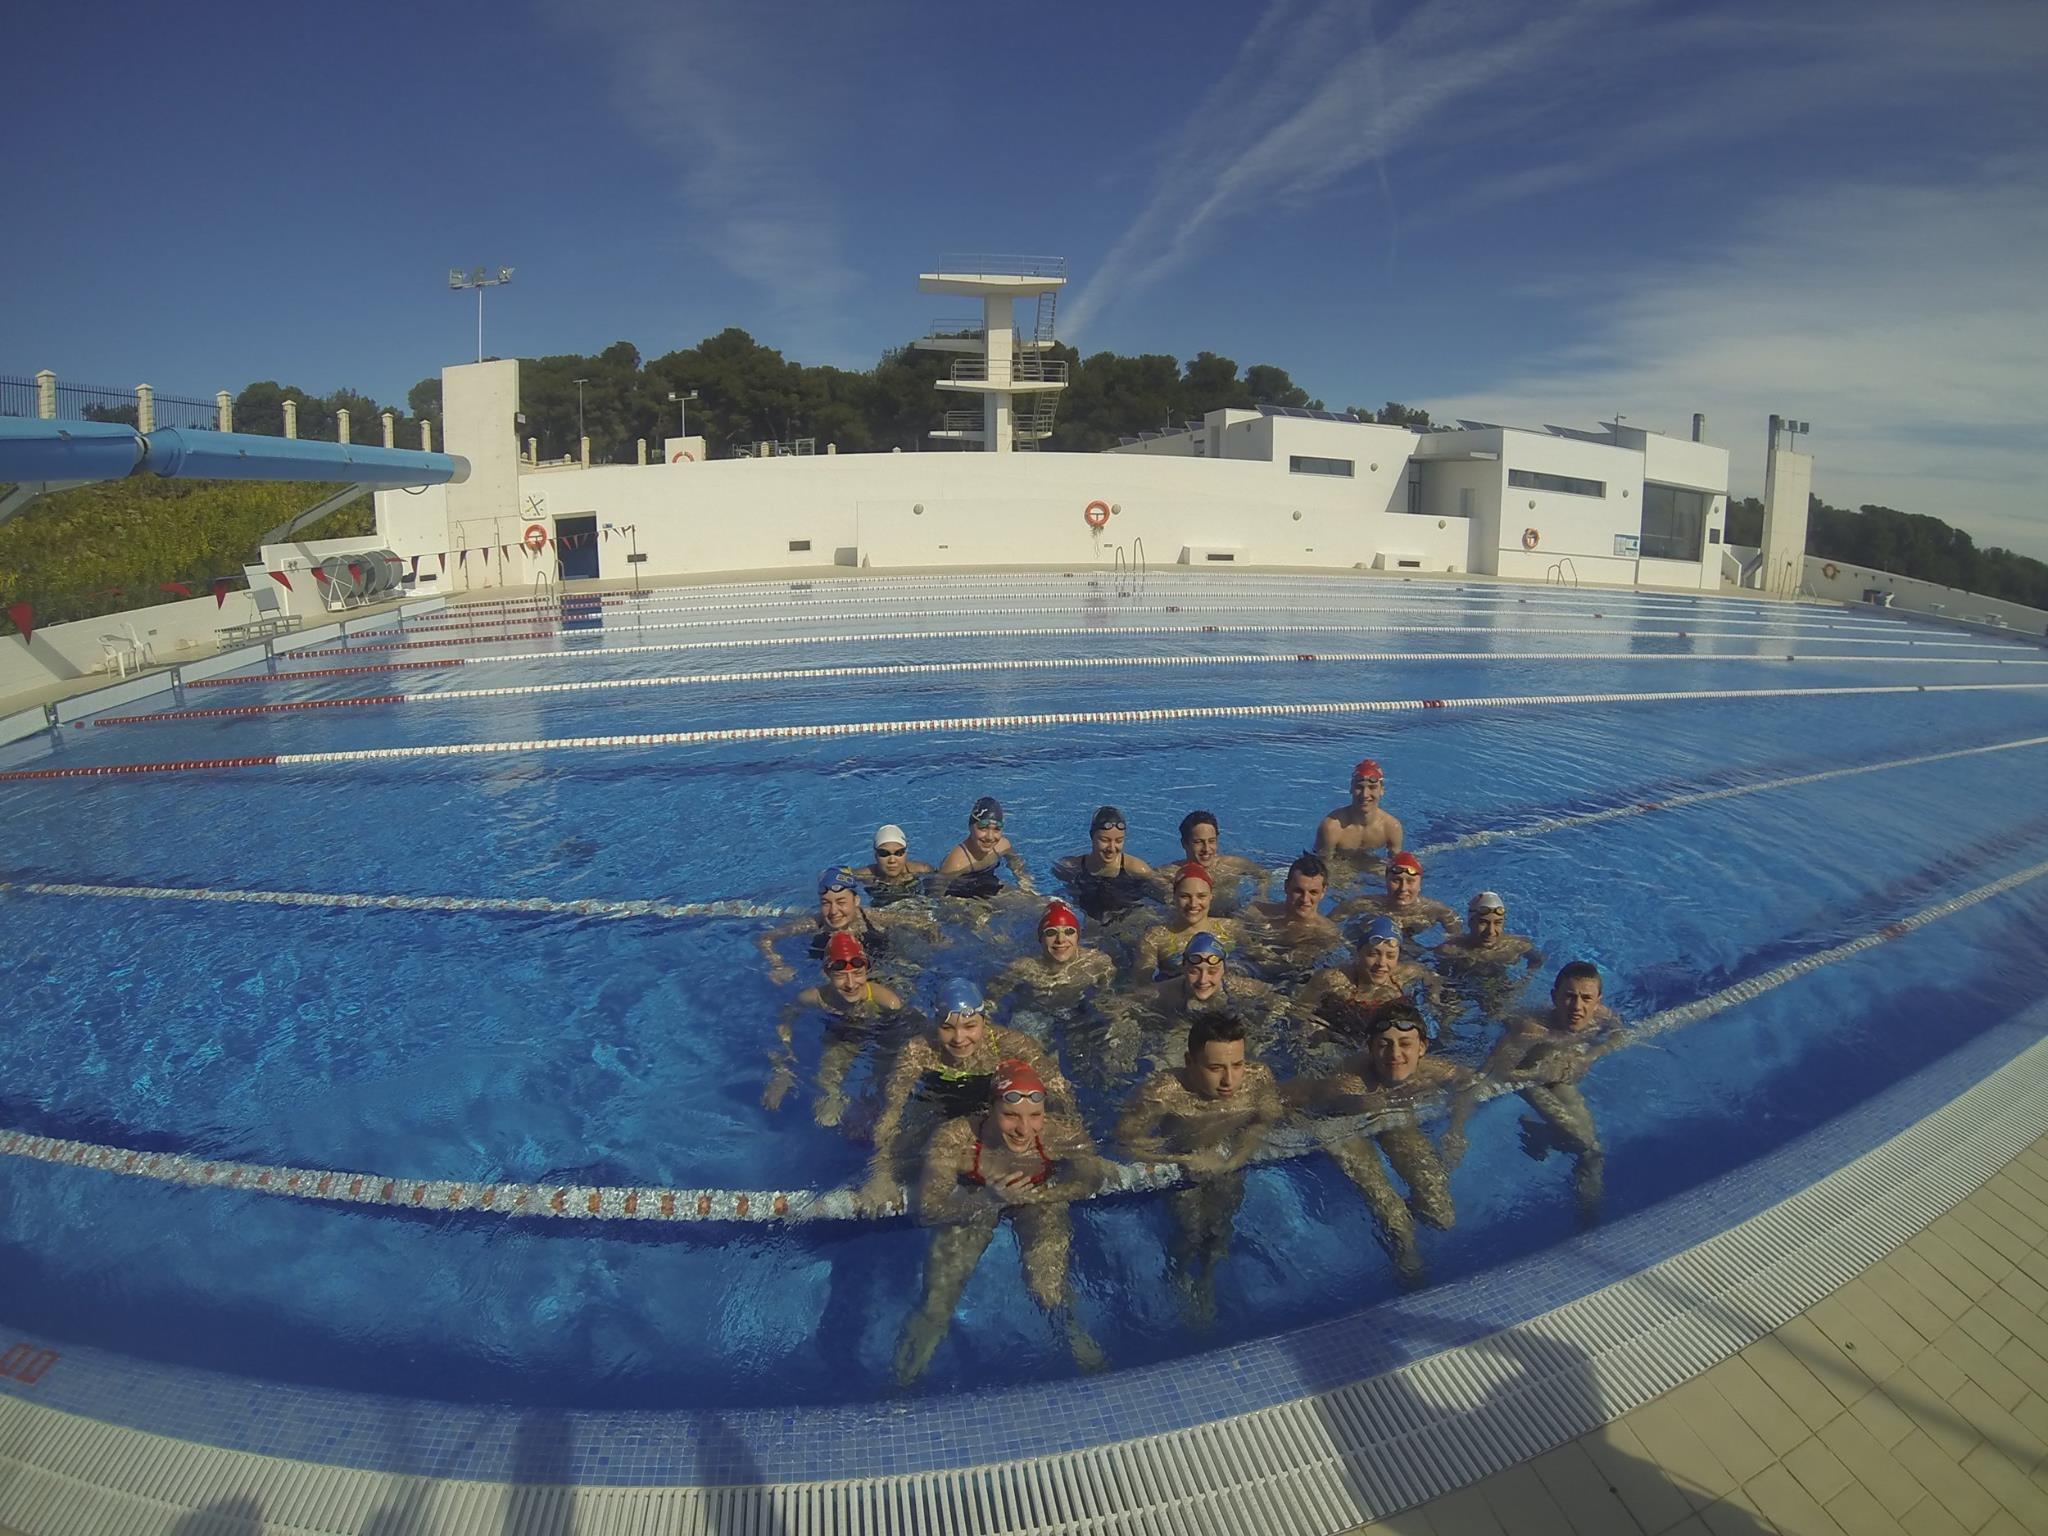 Soissons natation sportive accueil abcnatation - Horaire piscine soissons ...